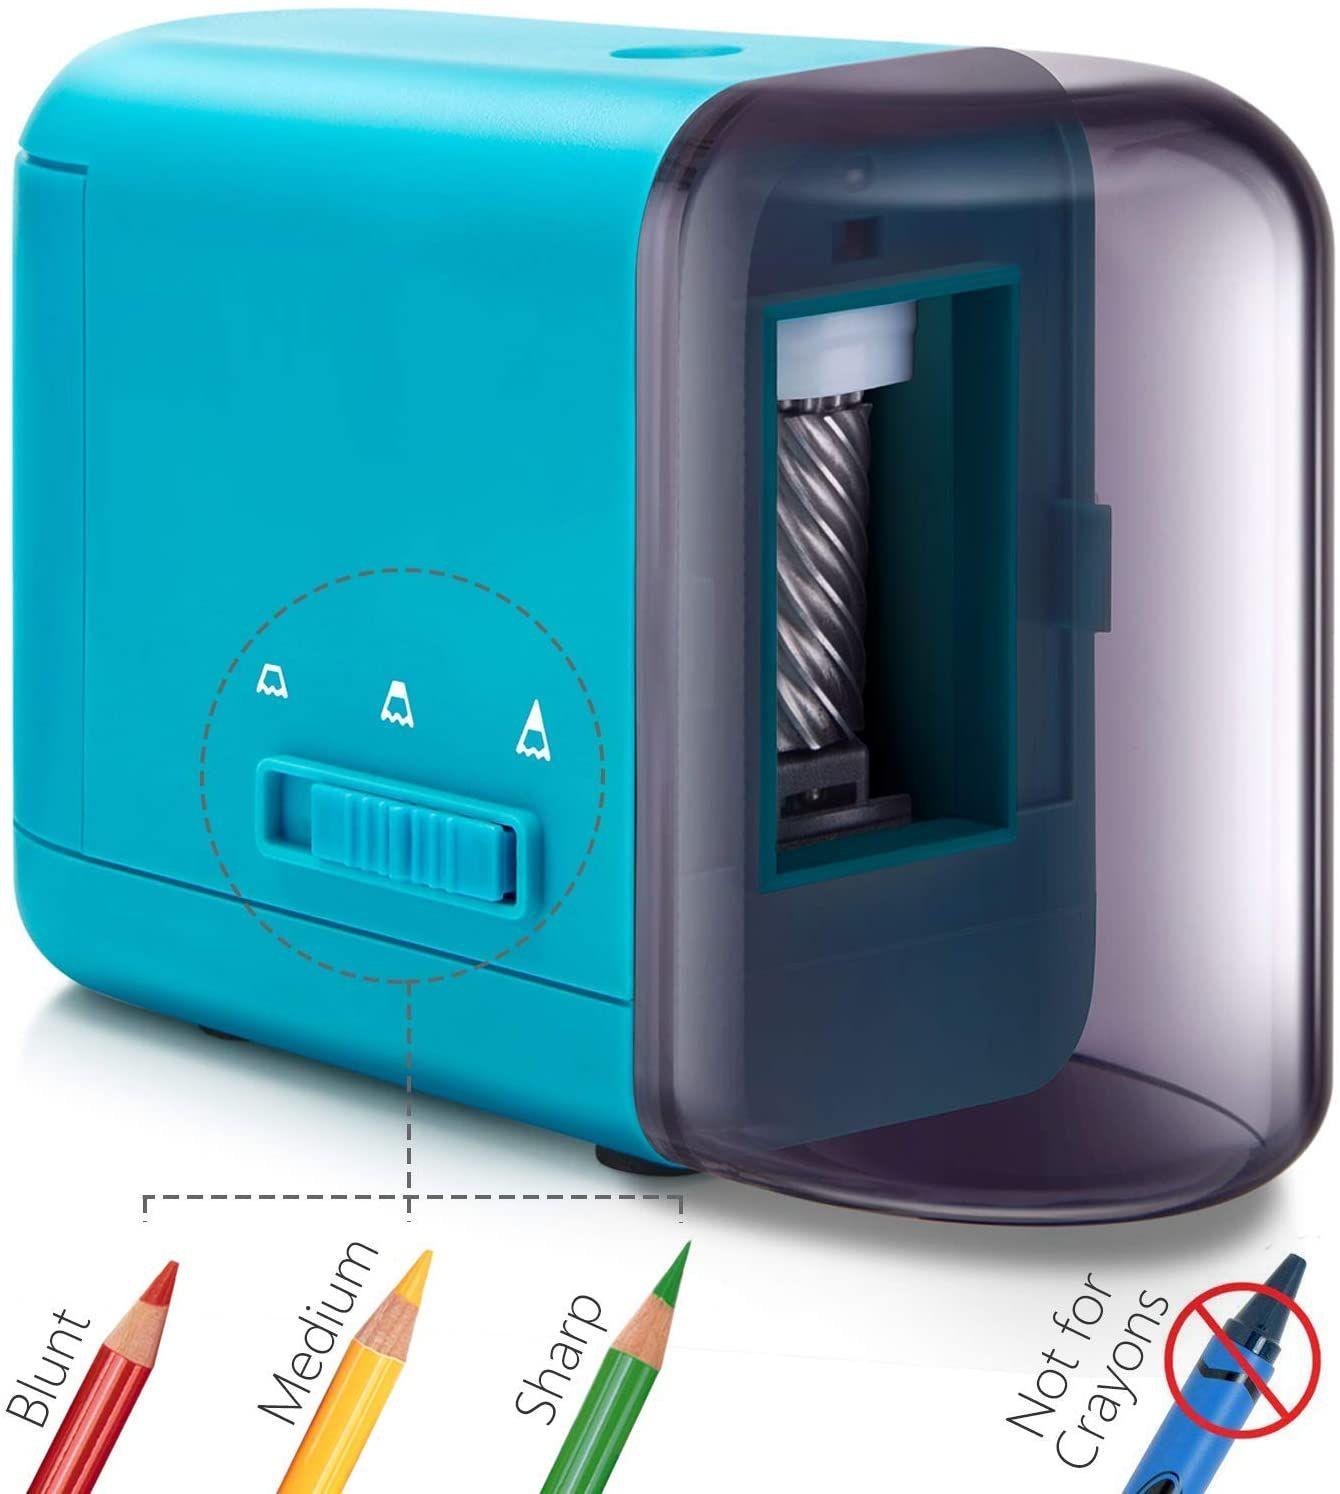 3 colored pencil sharpener electric pencil sharpener